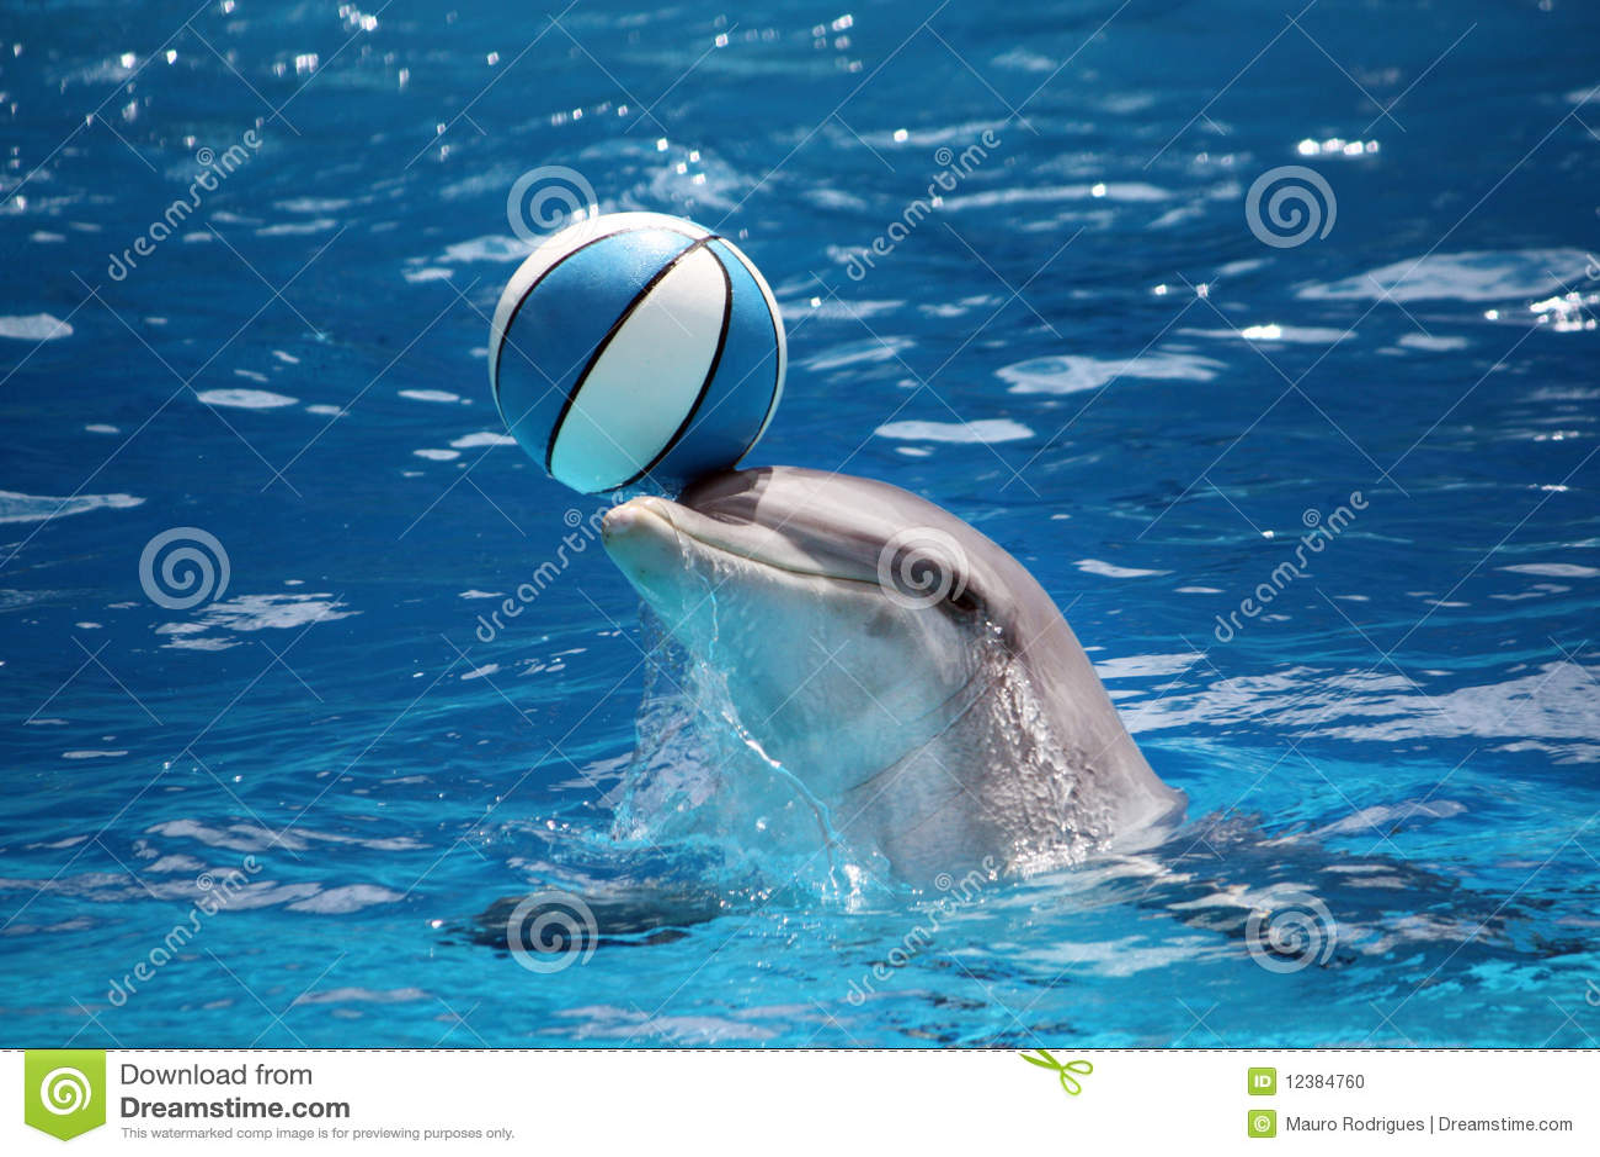 Animal Print Wallpaper Uk Dolphin With Ball Stock Photo Image 12384760